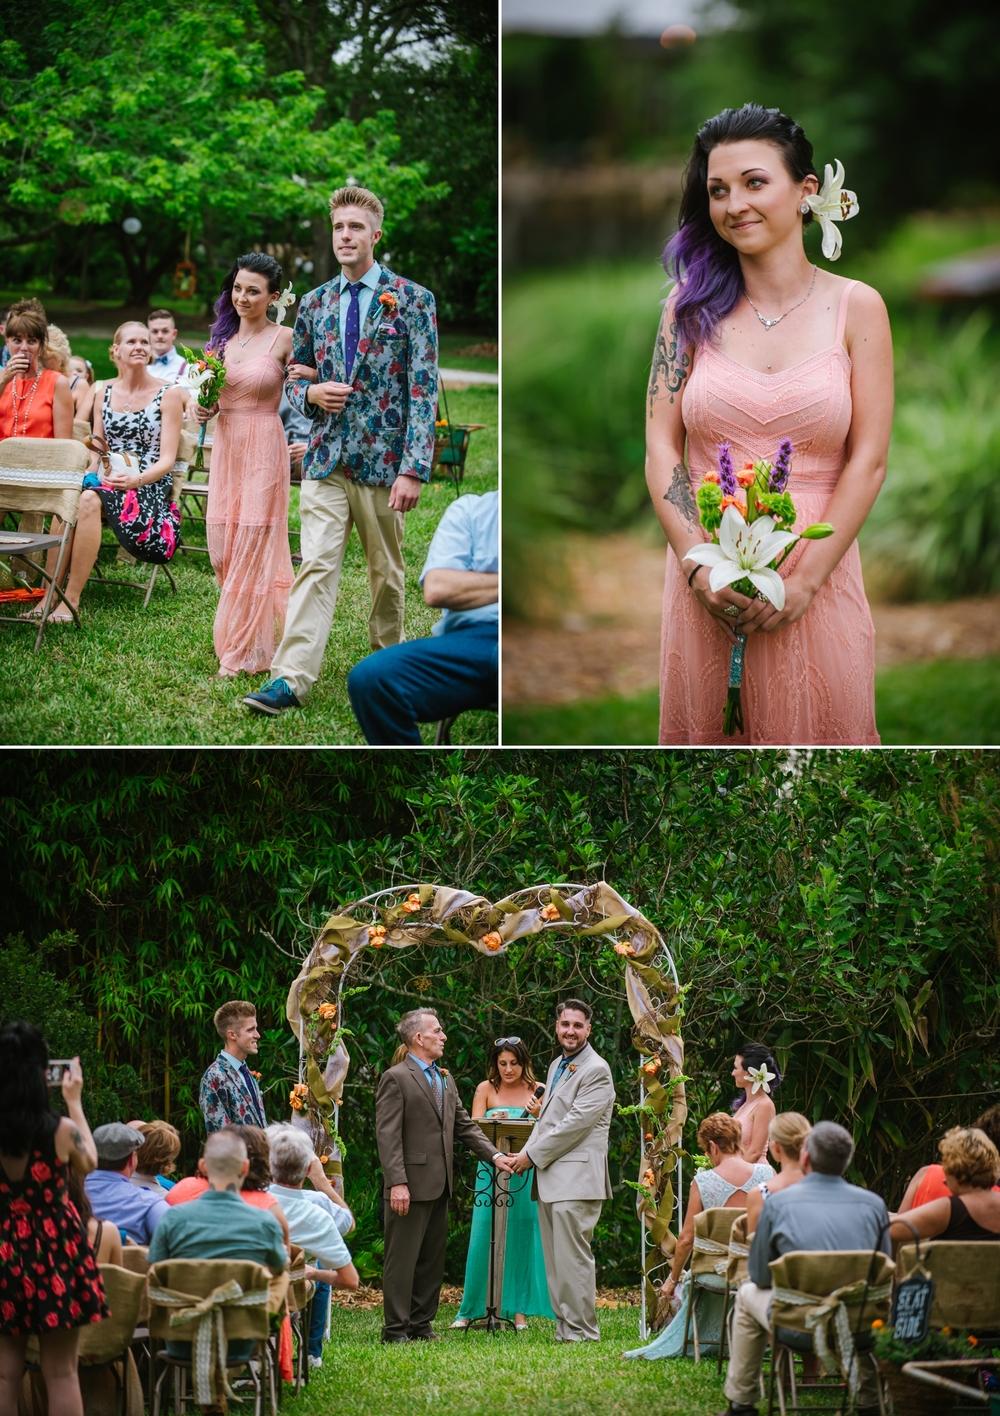 tampa-wedding-photographer-ashlee-hamon-lgbt-wedding_0011.jpg